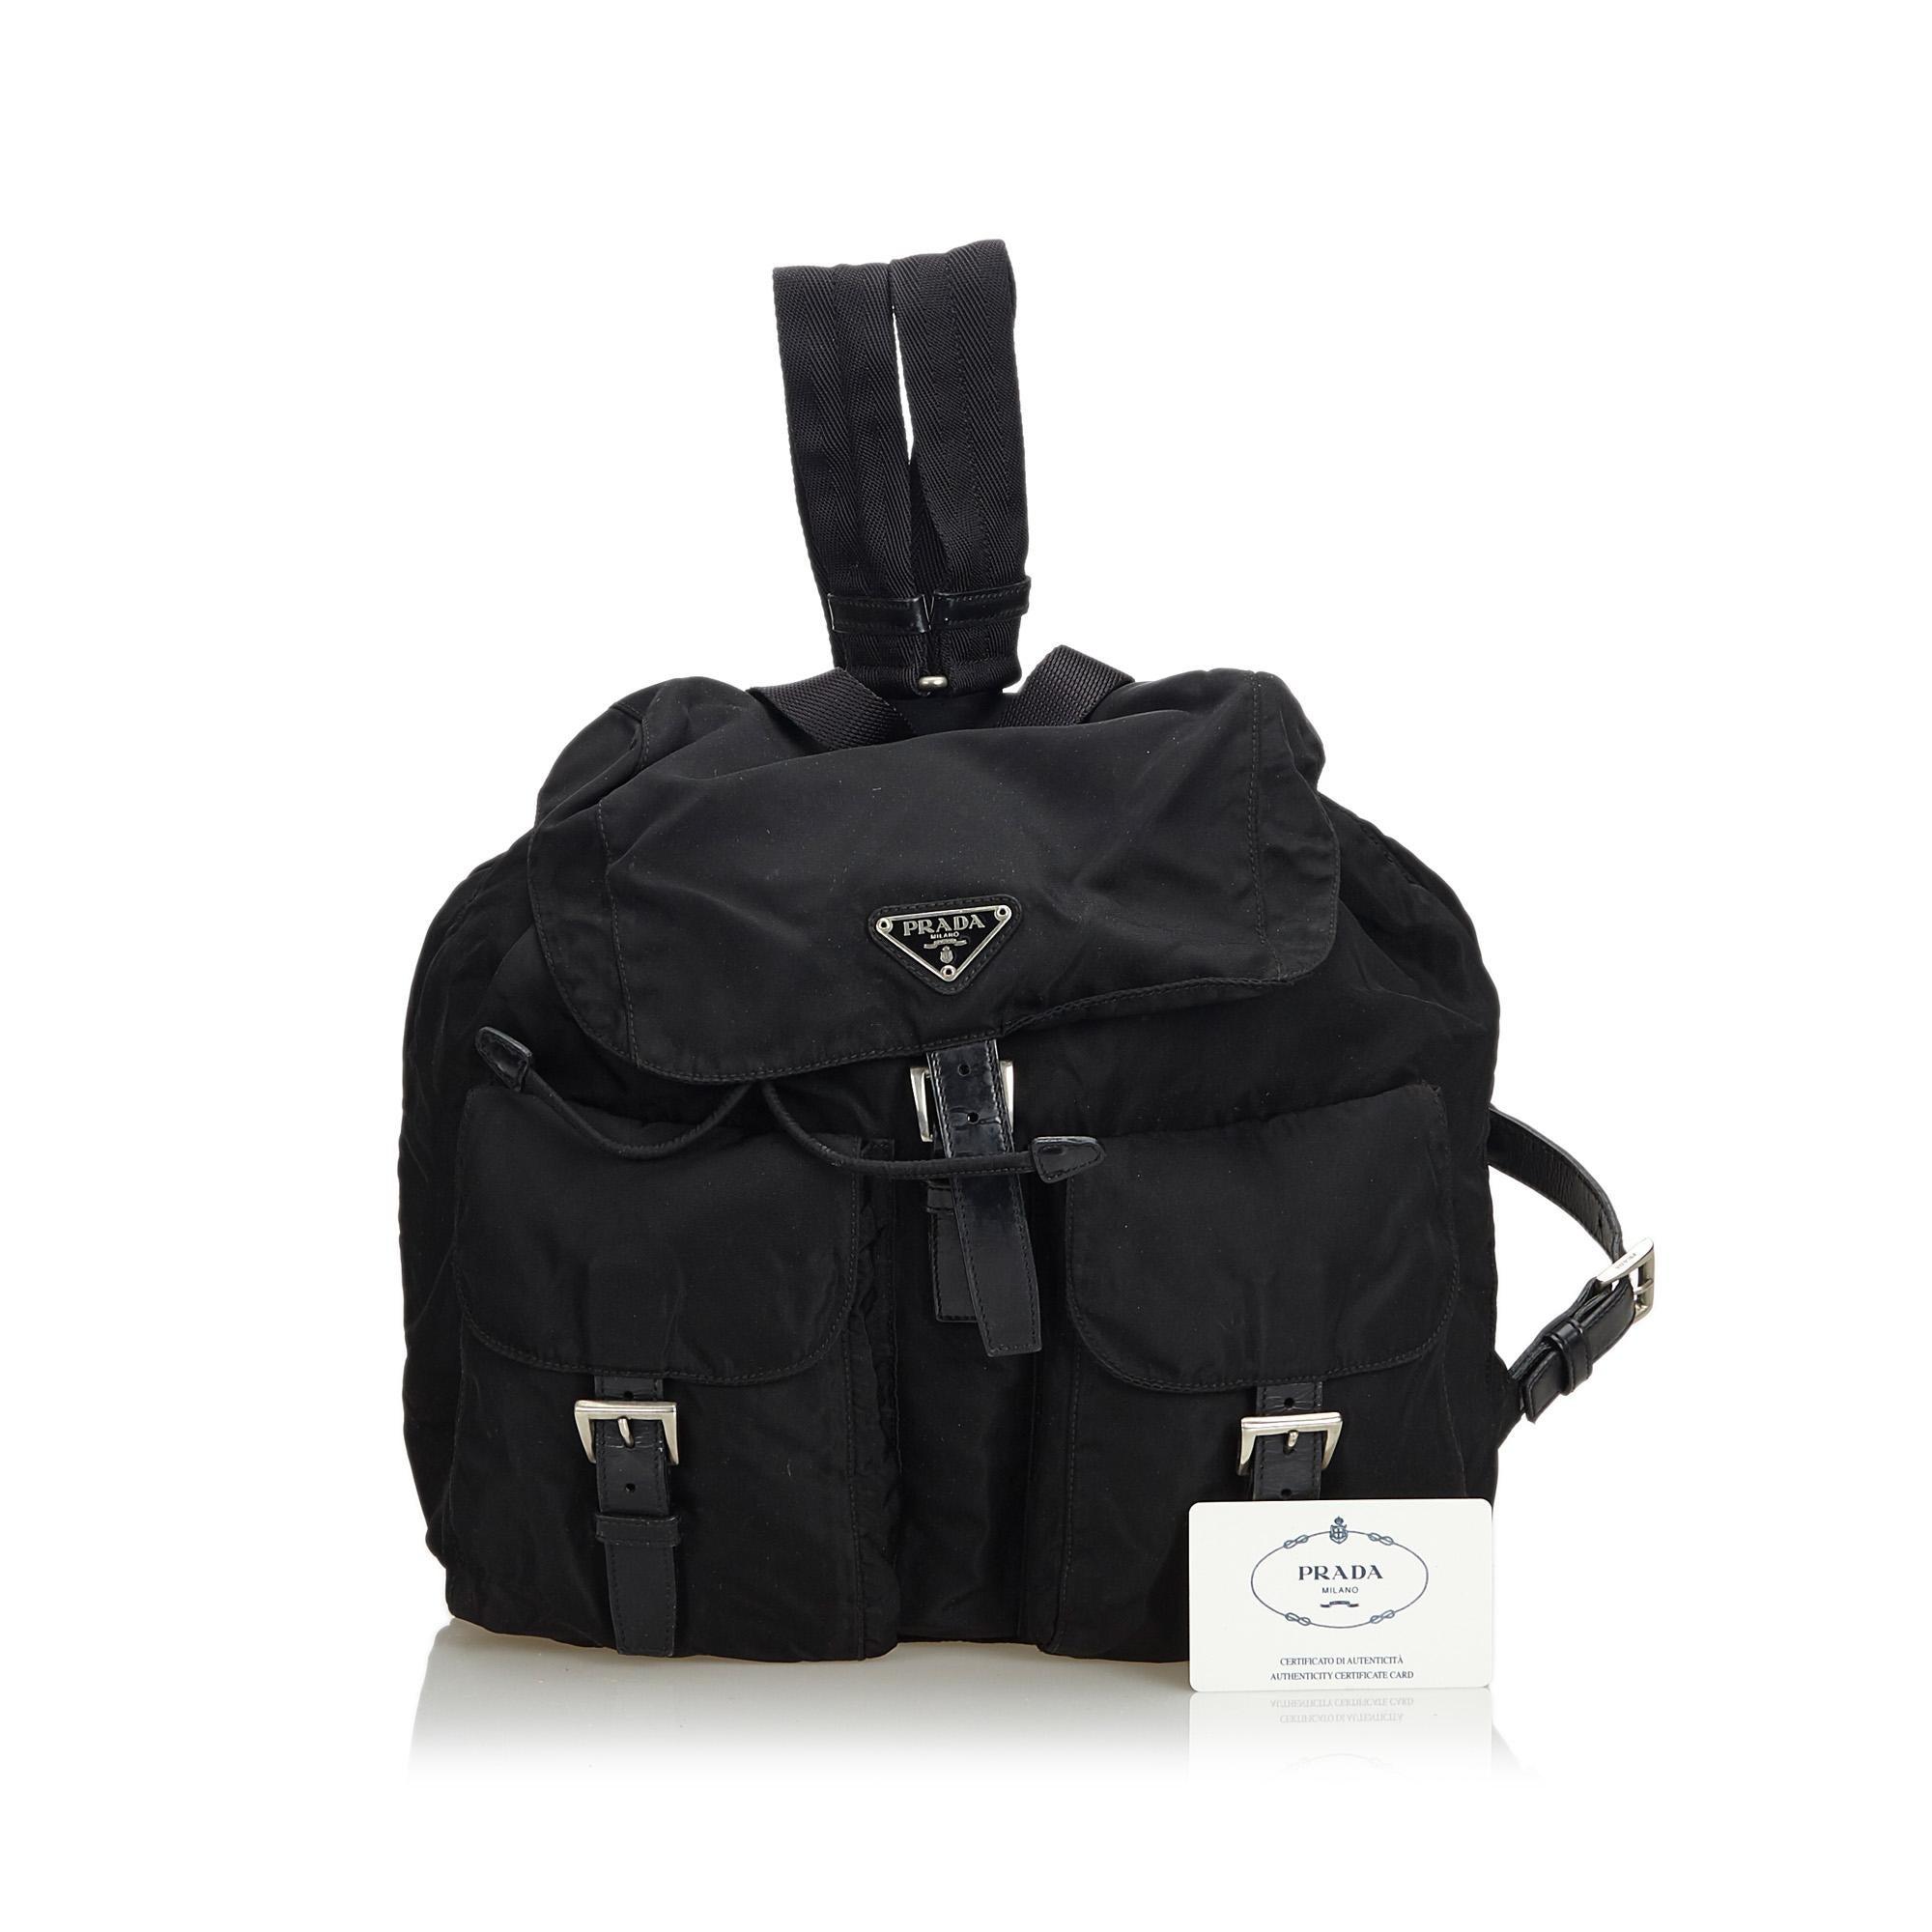 b248b9f8c8b4 Prada Black Nylon Fabric Drawstring Backpack Italy w/ Authenticity Card at  1stdibs